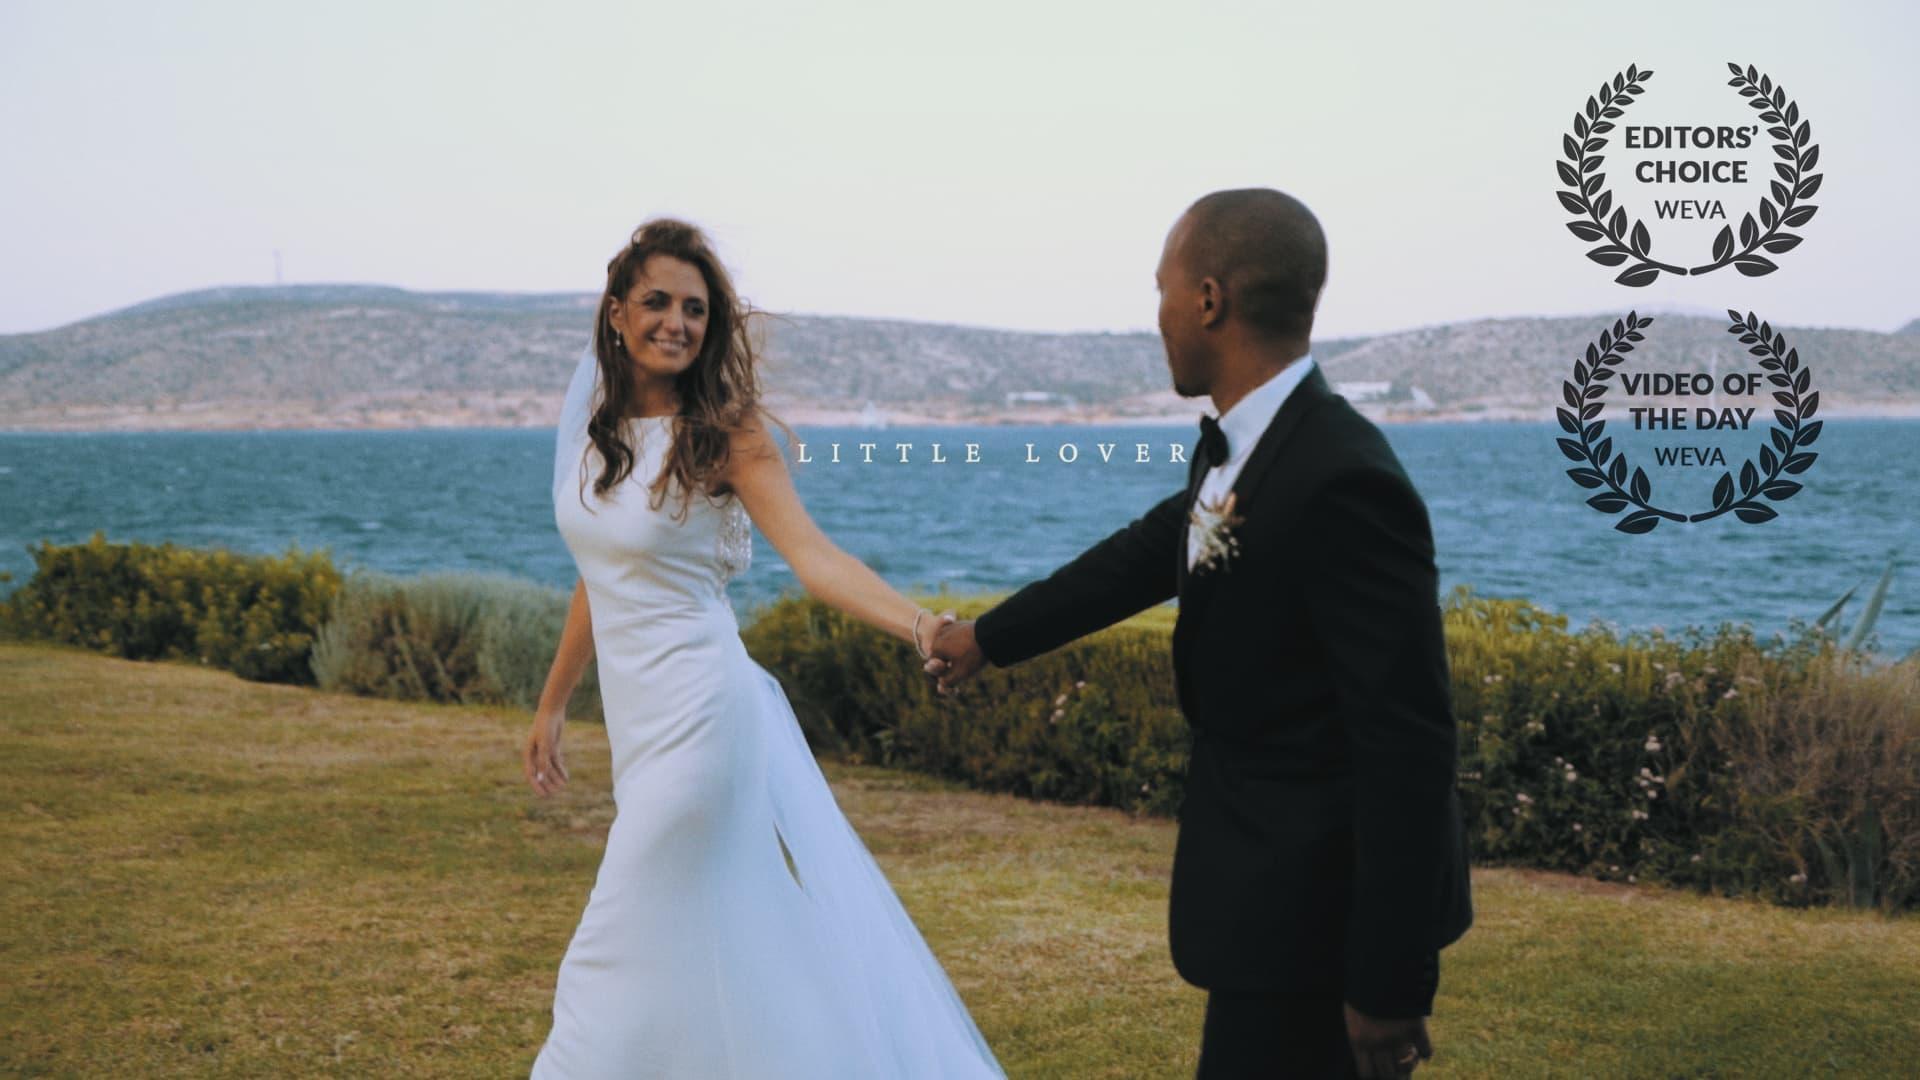 Luxury Wedding Video From Romania To Greece Onirama Mpasis